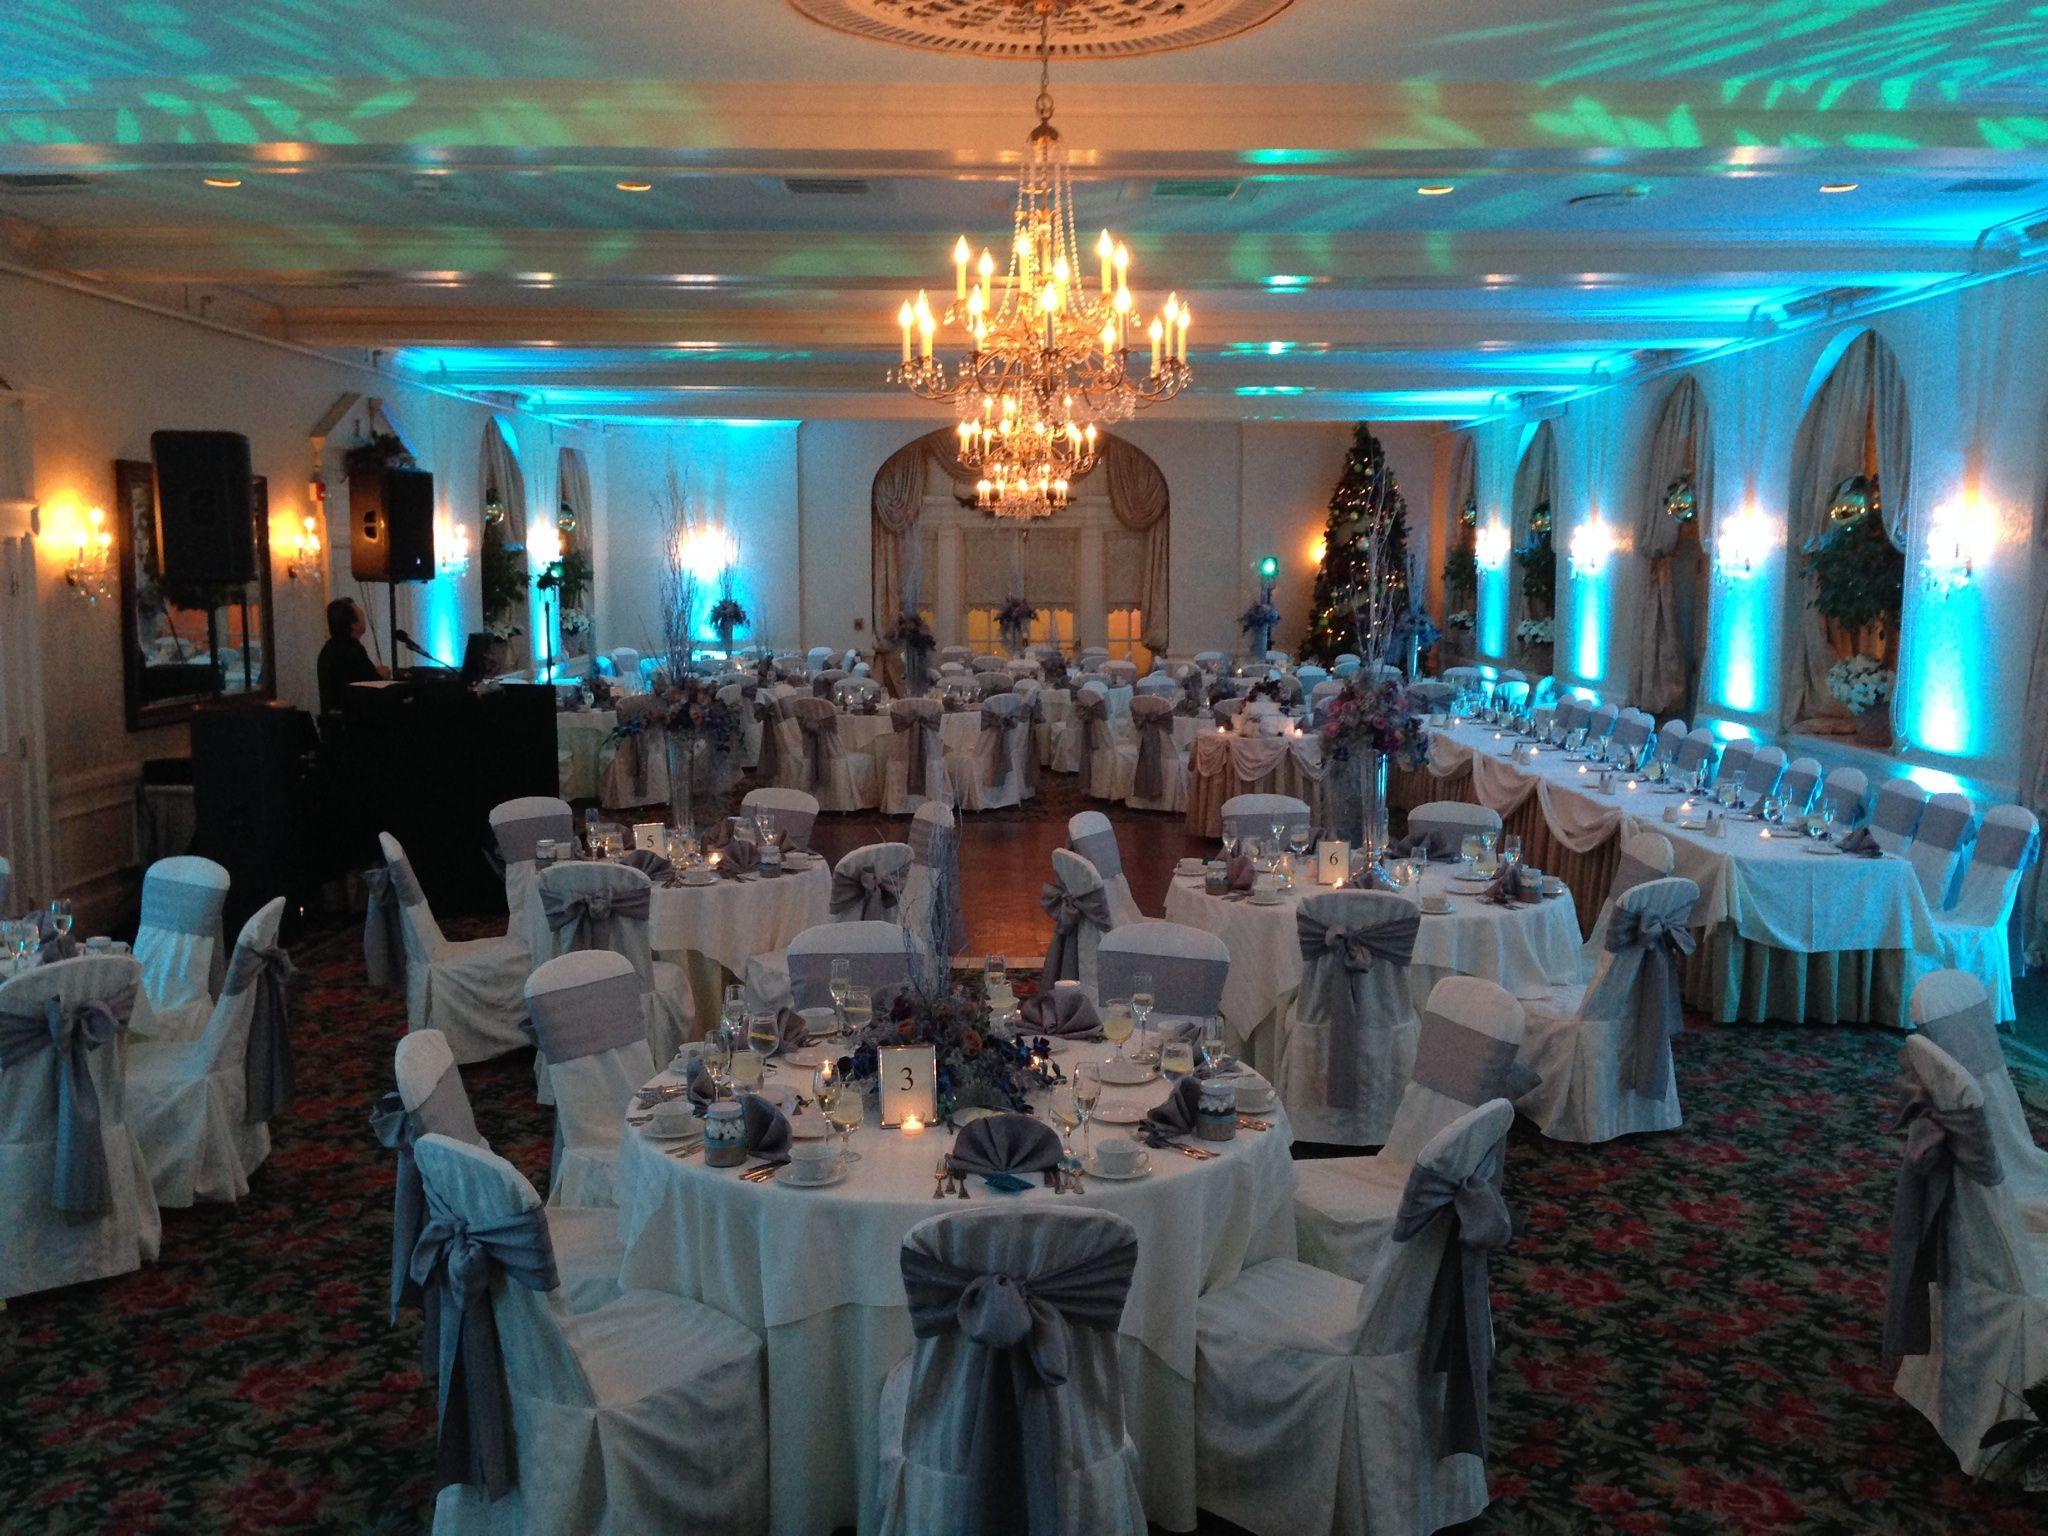 Grand ballroom at the hotel northampton winter wedding weddings grand ballroom at the hotel northampton winter wedding weddings hotelnorthampton northamptonma junglespirit Images